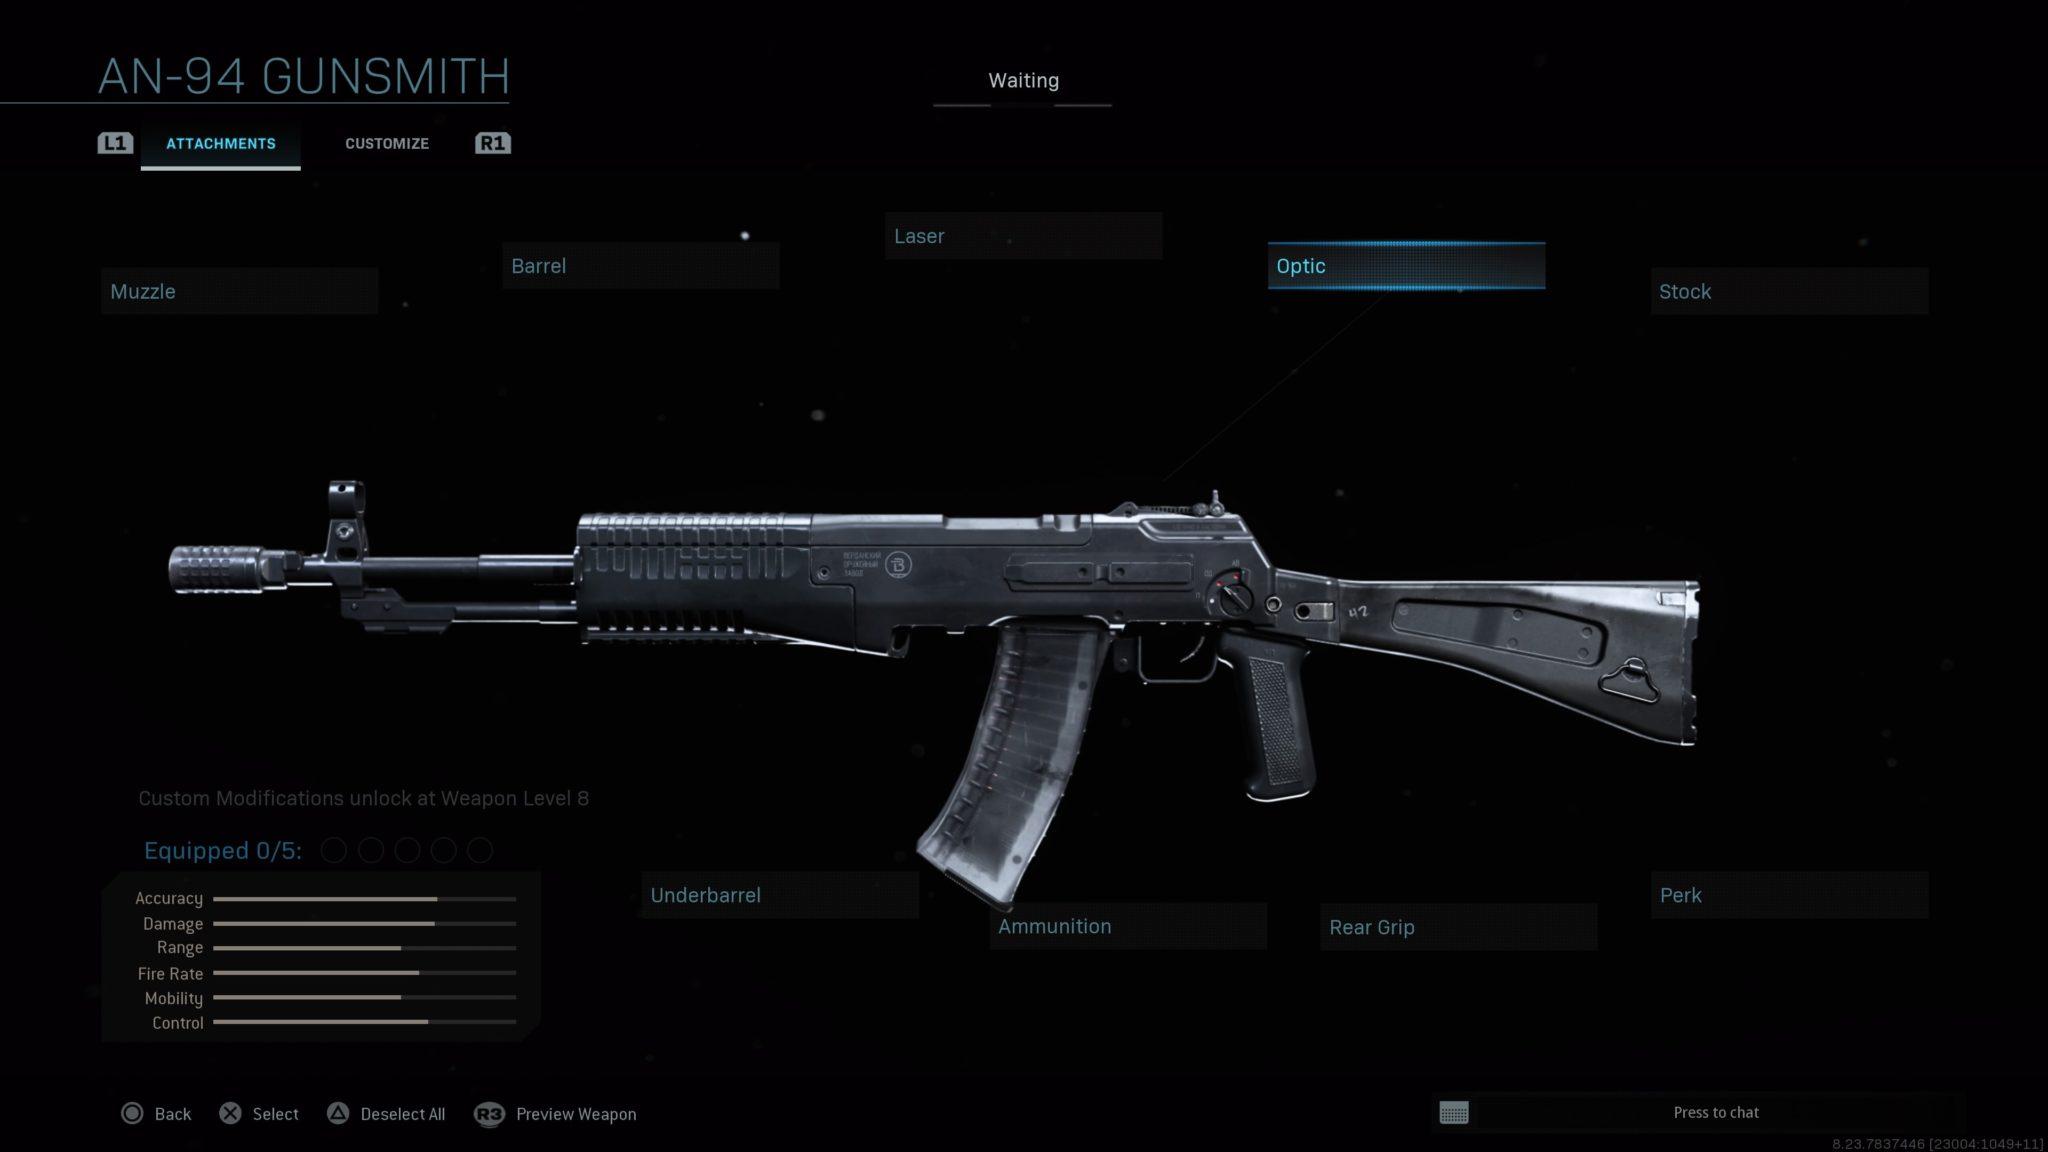 All the AN-94 assault rifle customization options in the Modern Wafare gunsmith.